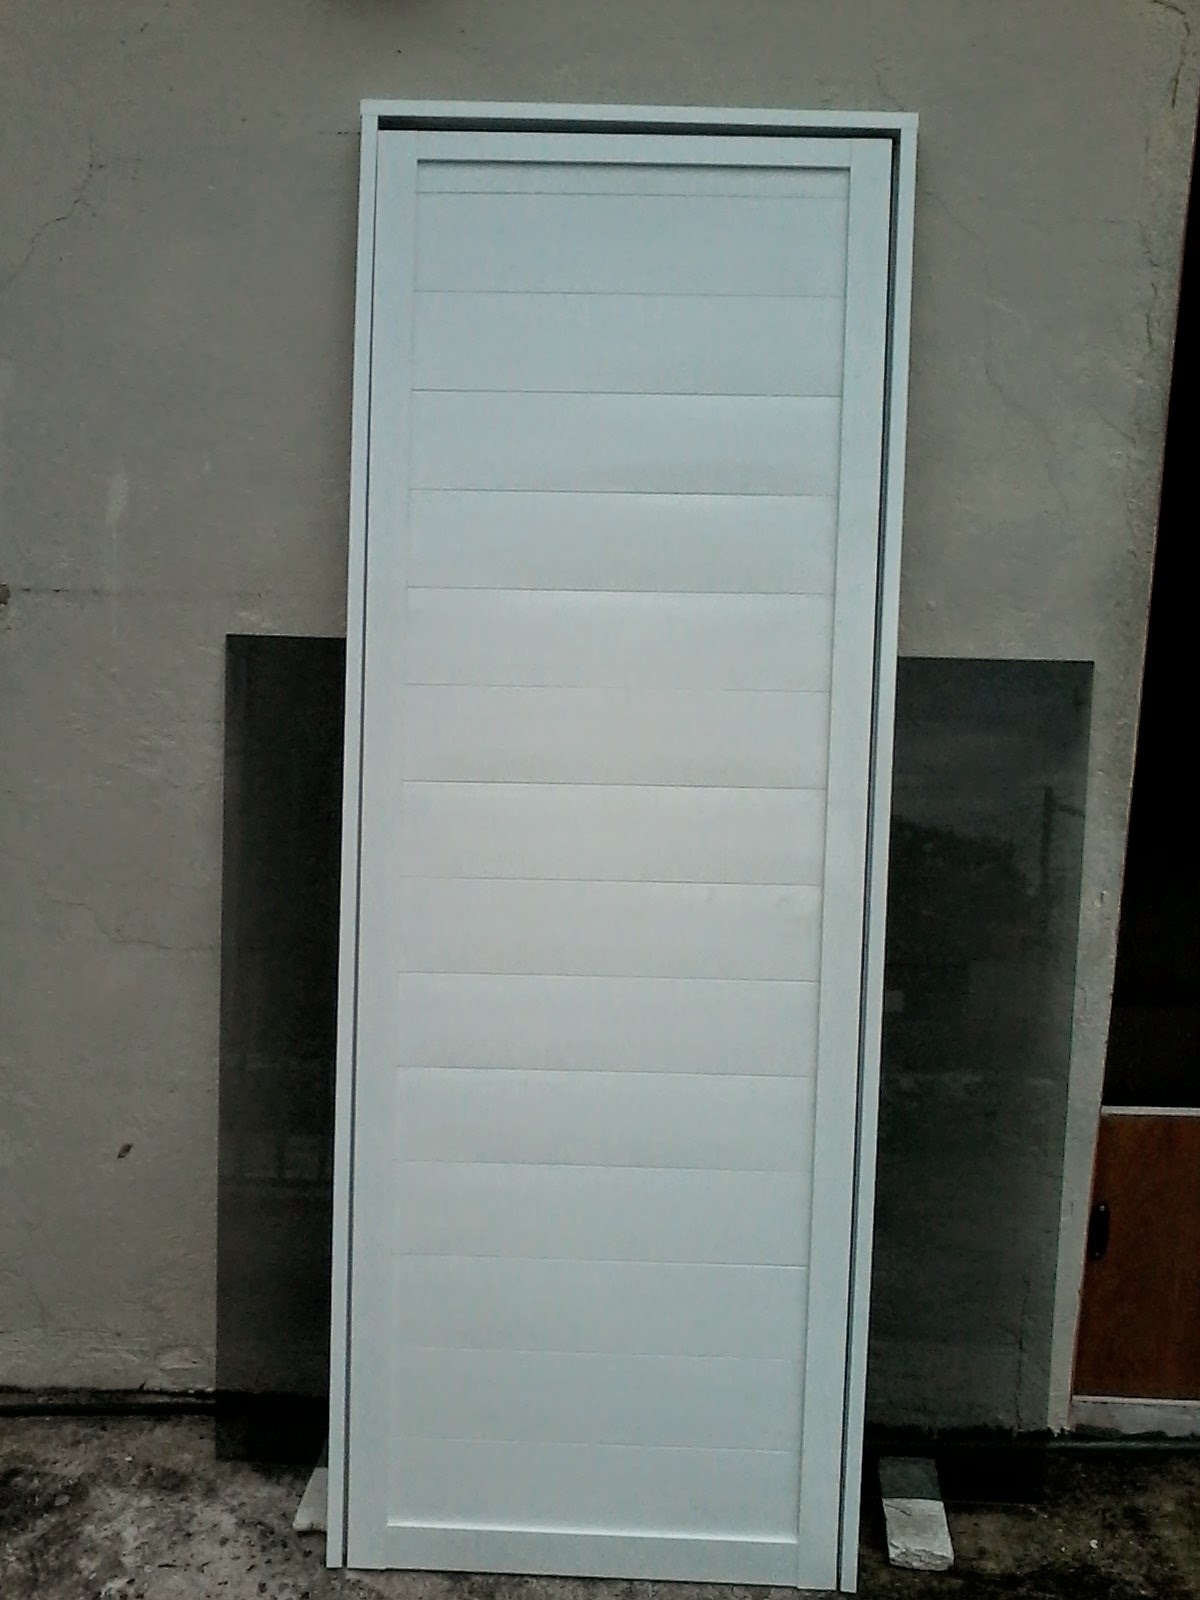 Imagenes de puertas para ba o de aluminio for Puertas de aluminio para bano